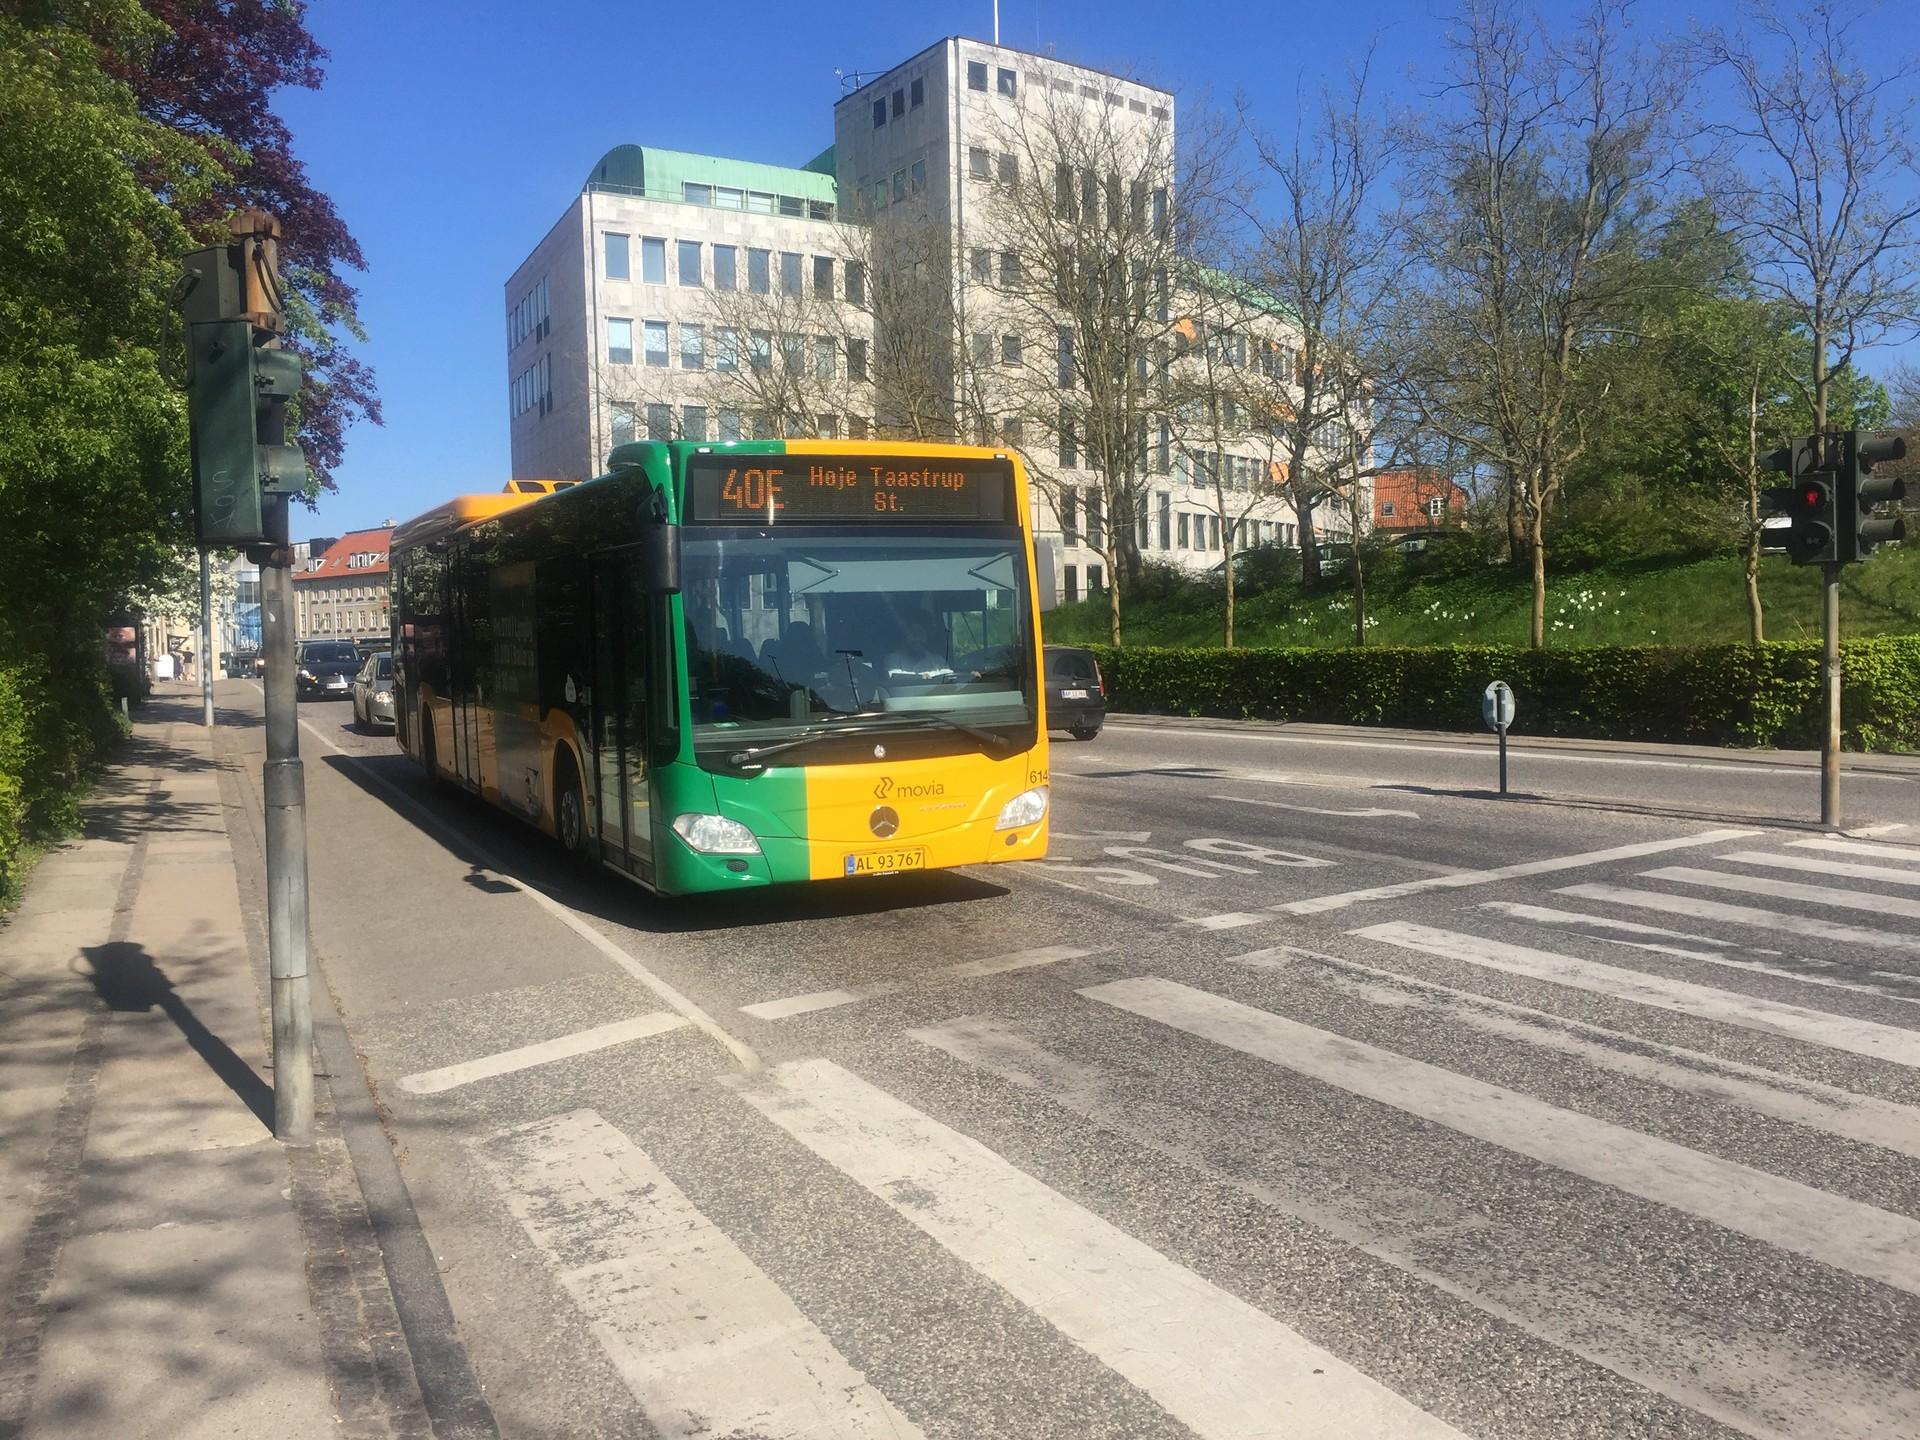 Esperienza a Lyngby, Danimarca di Kristina